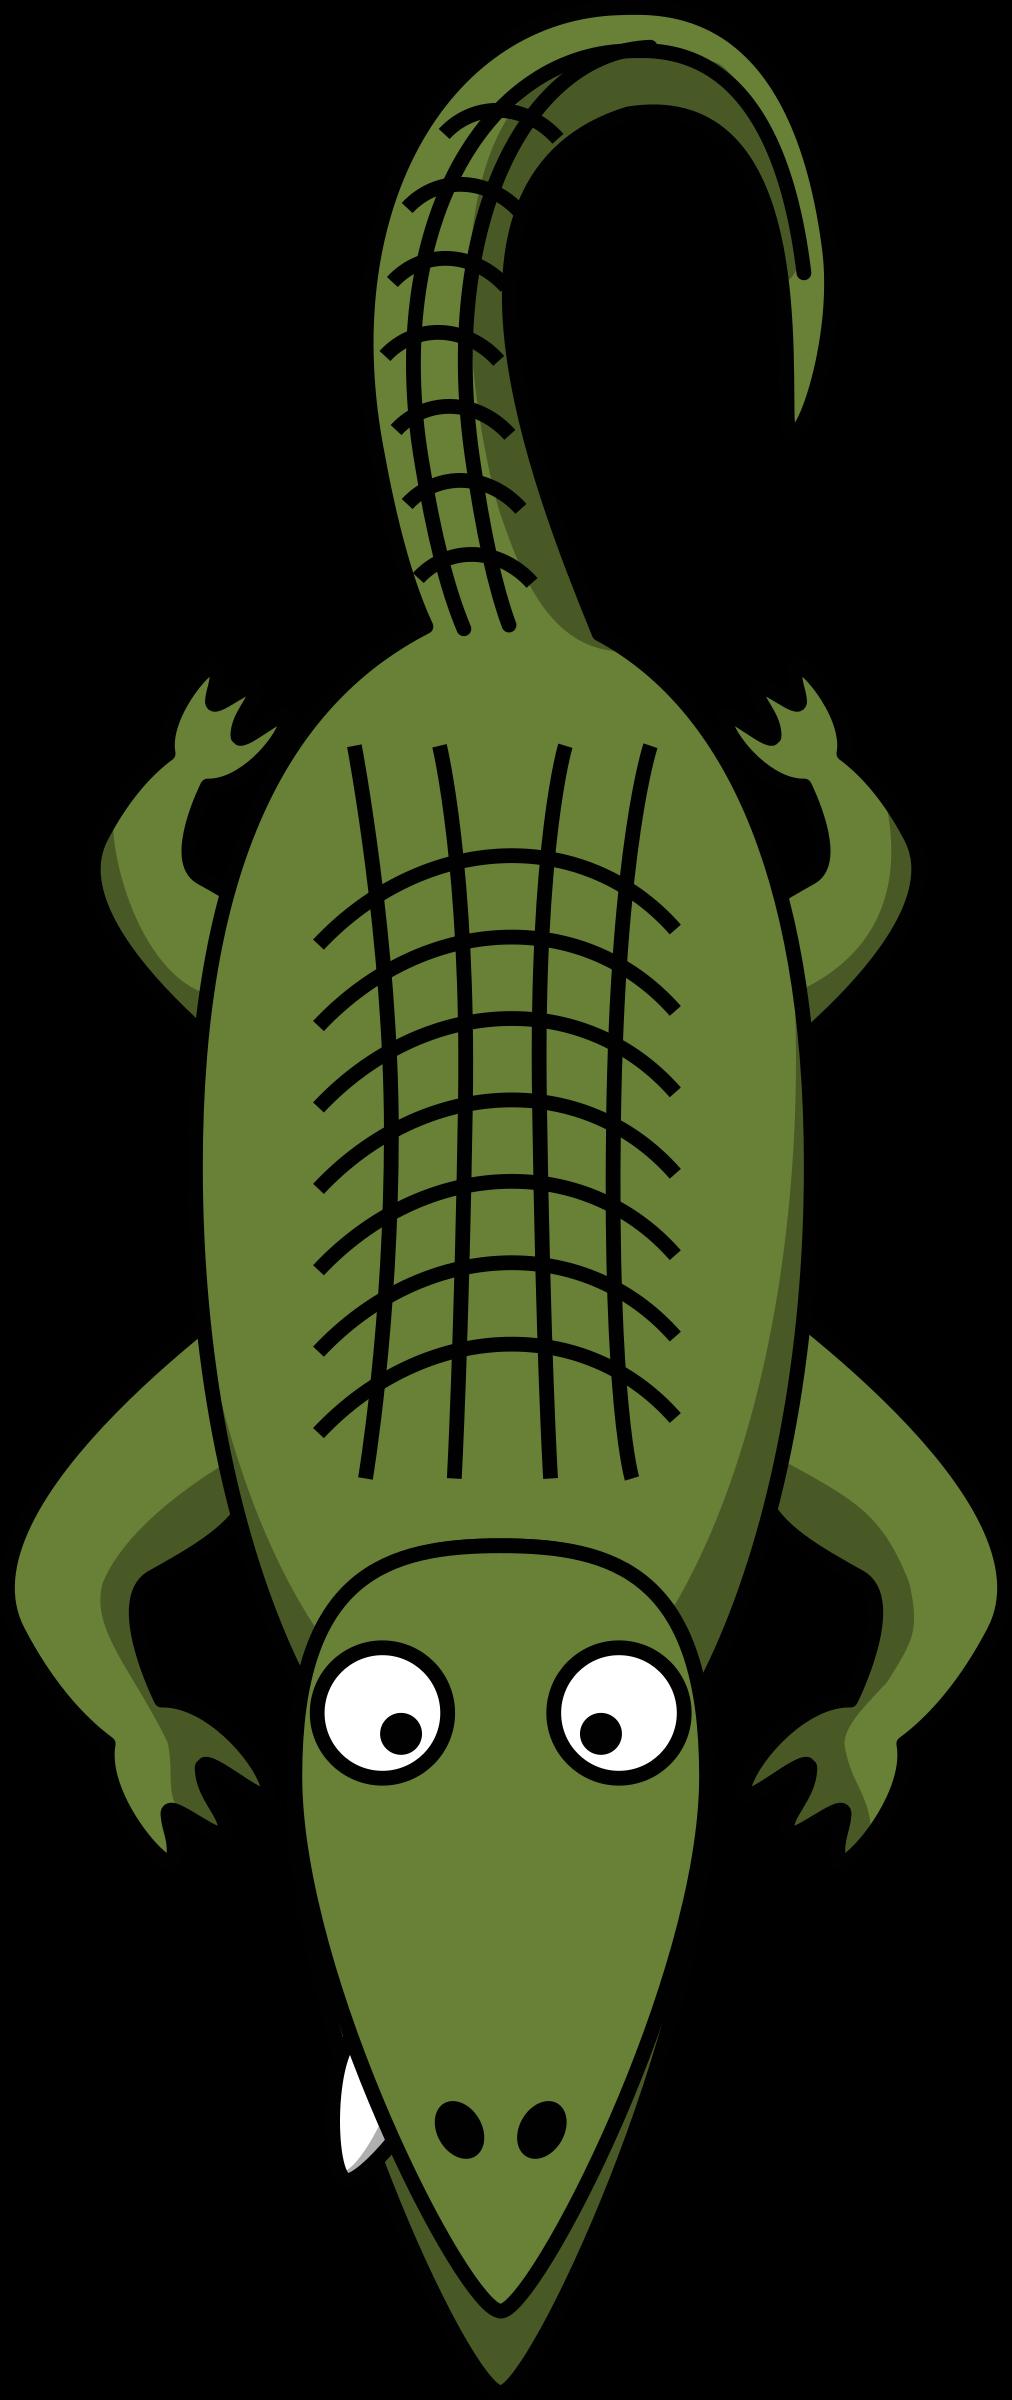 Crocodile clipart toon. Cartoon alligator big image